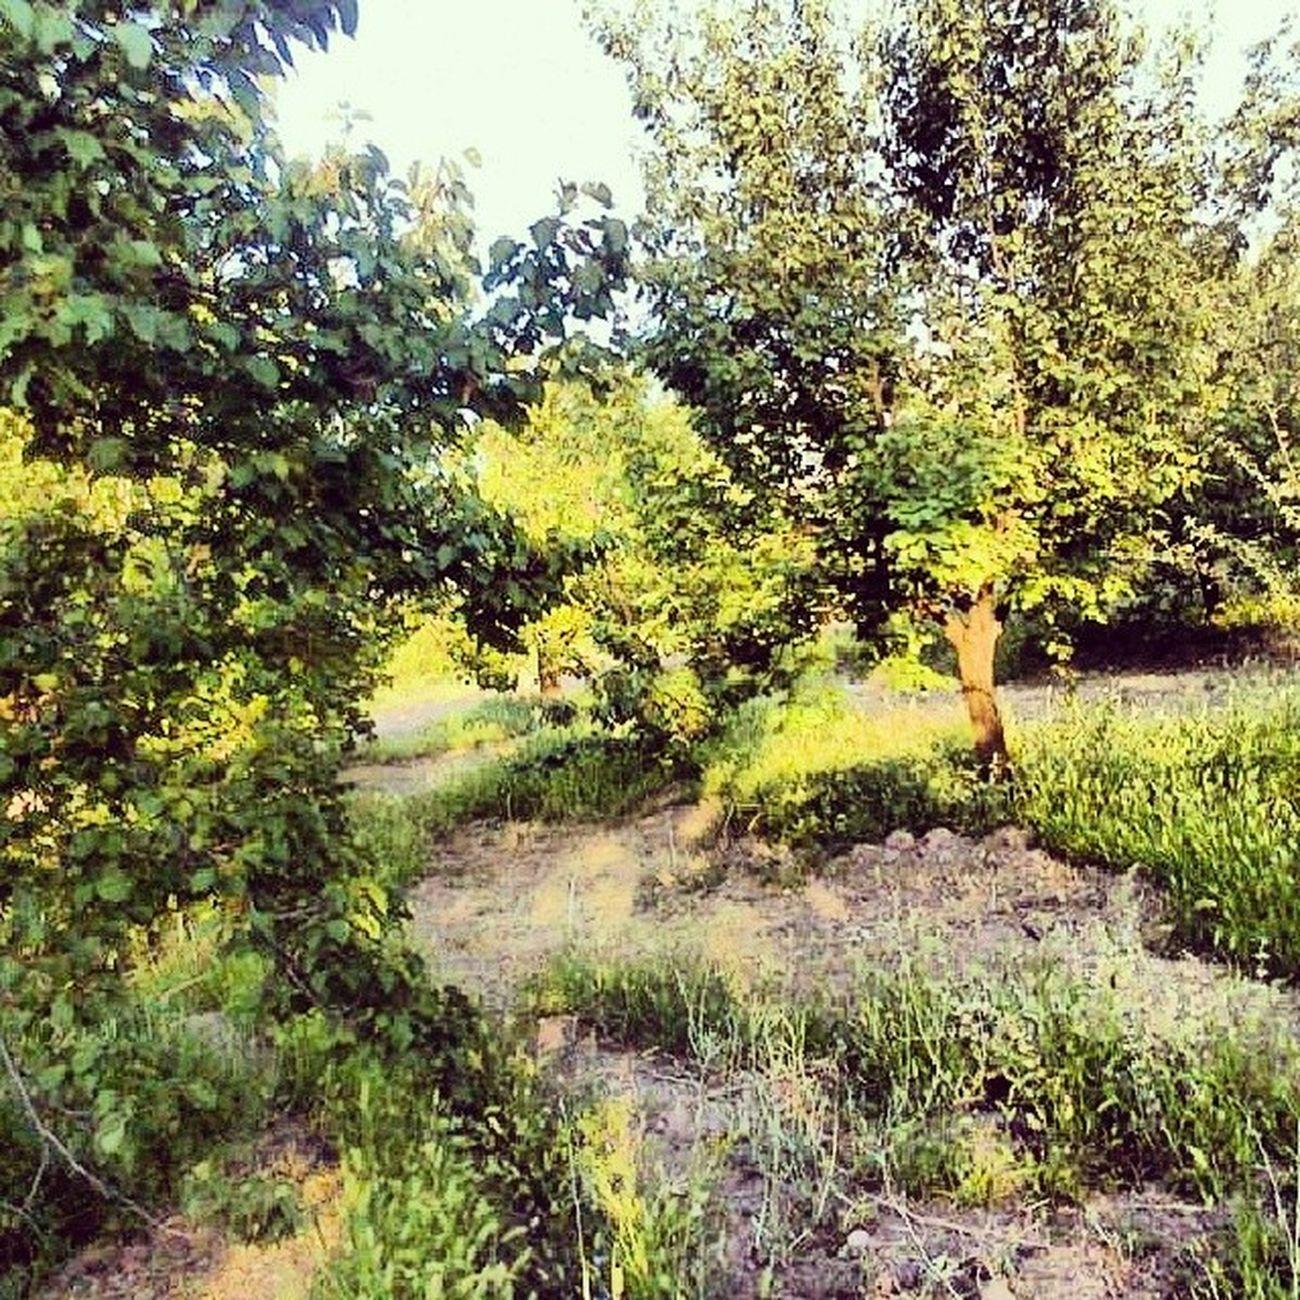 Malatya Kayısıkent Turkey Kayısı apricotinstagram instamood instashow greenlike nature nicepic photography photoshop ups blaa blaaaa